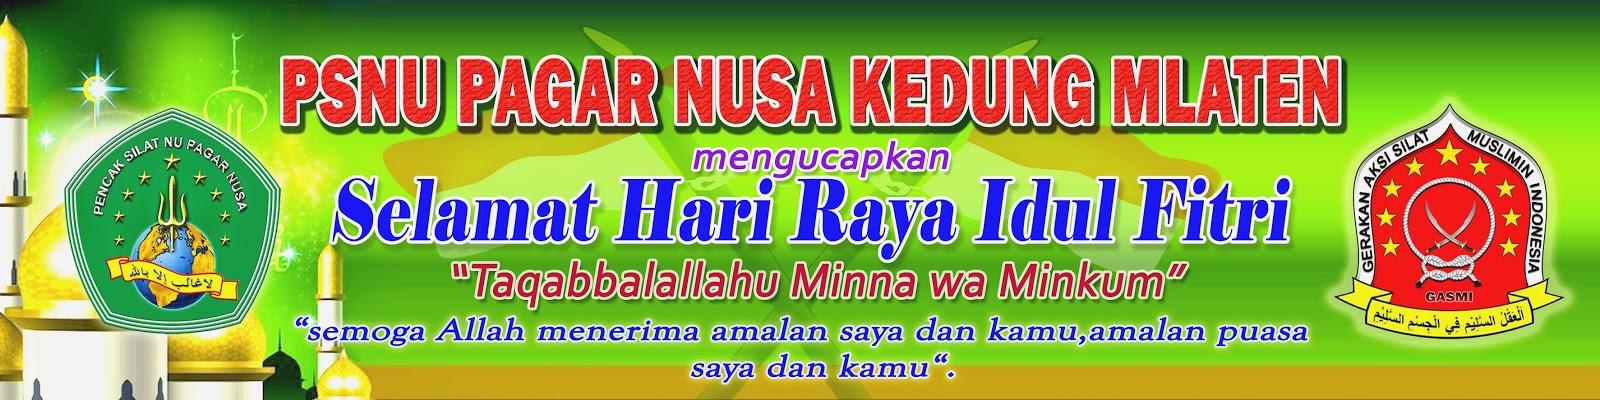 Download Psd Banner Pagar Nusa Selamat Lebaran Puasa Idul Fitri